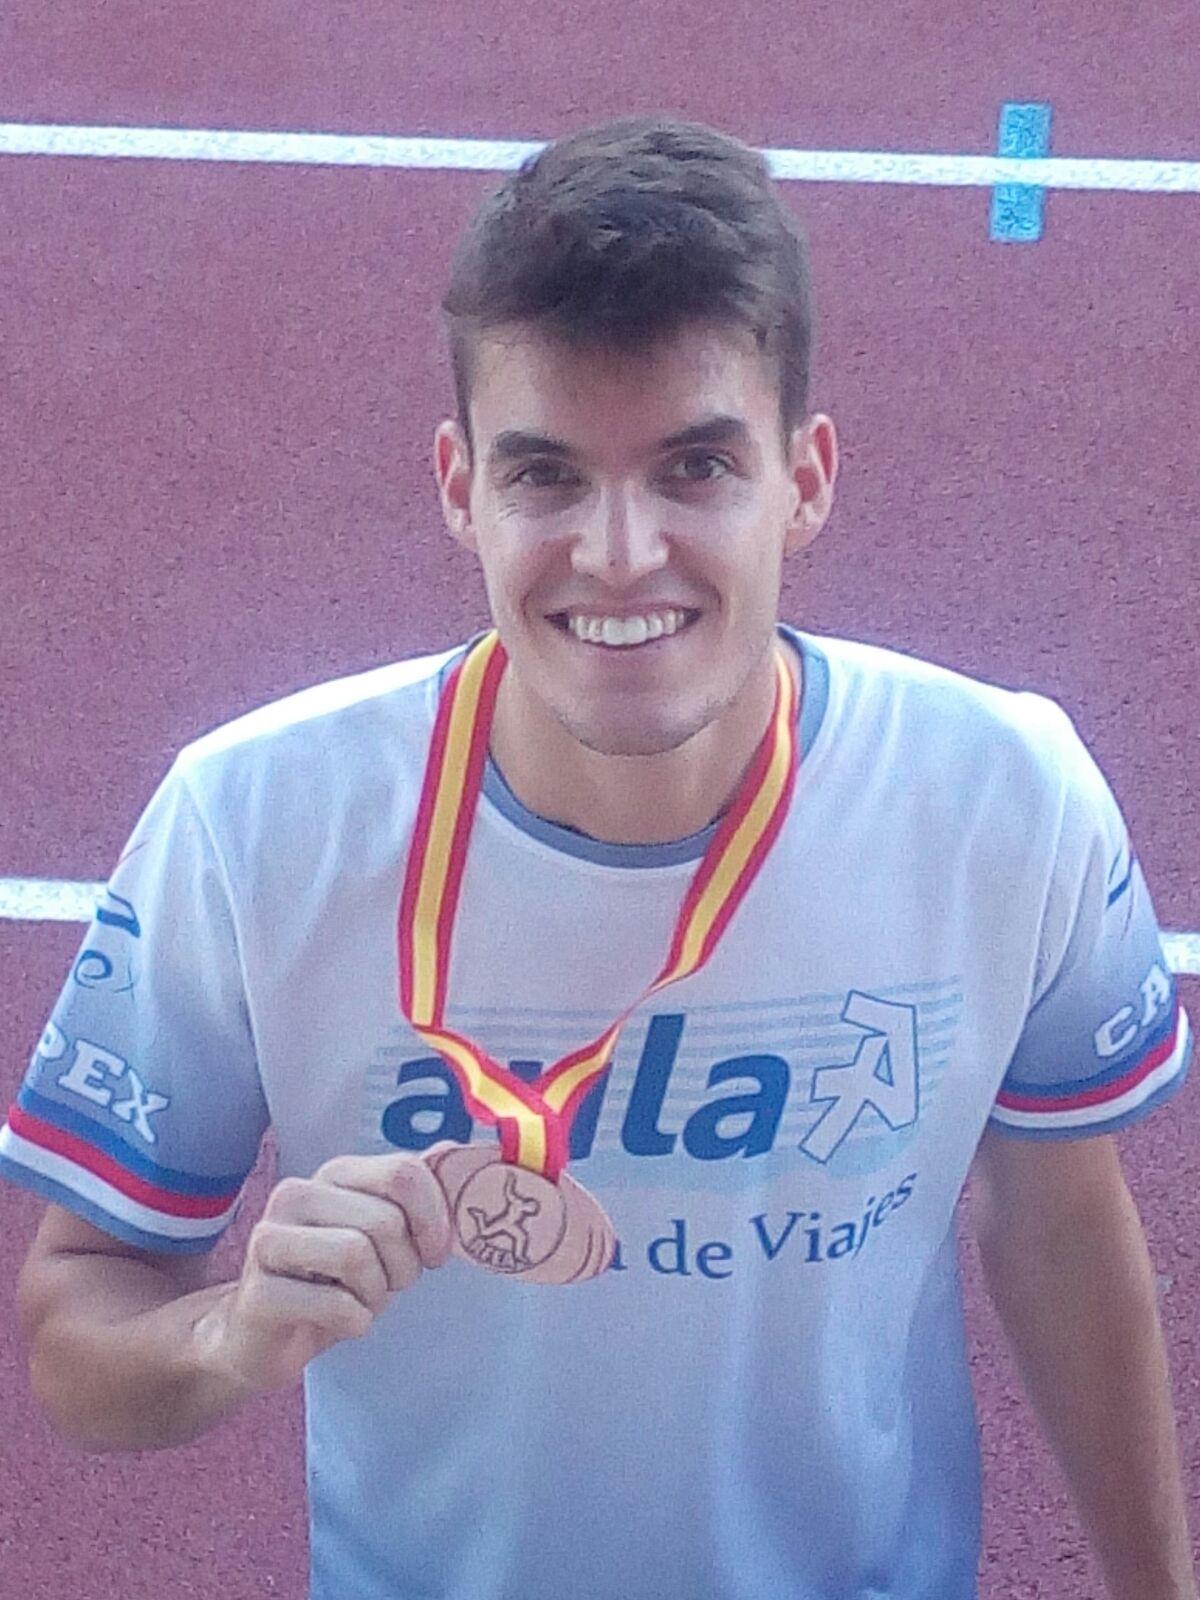 Sergio Paniagua Capex